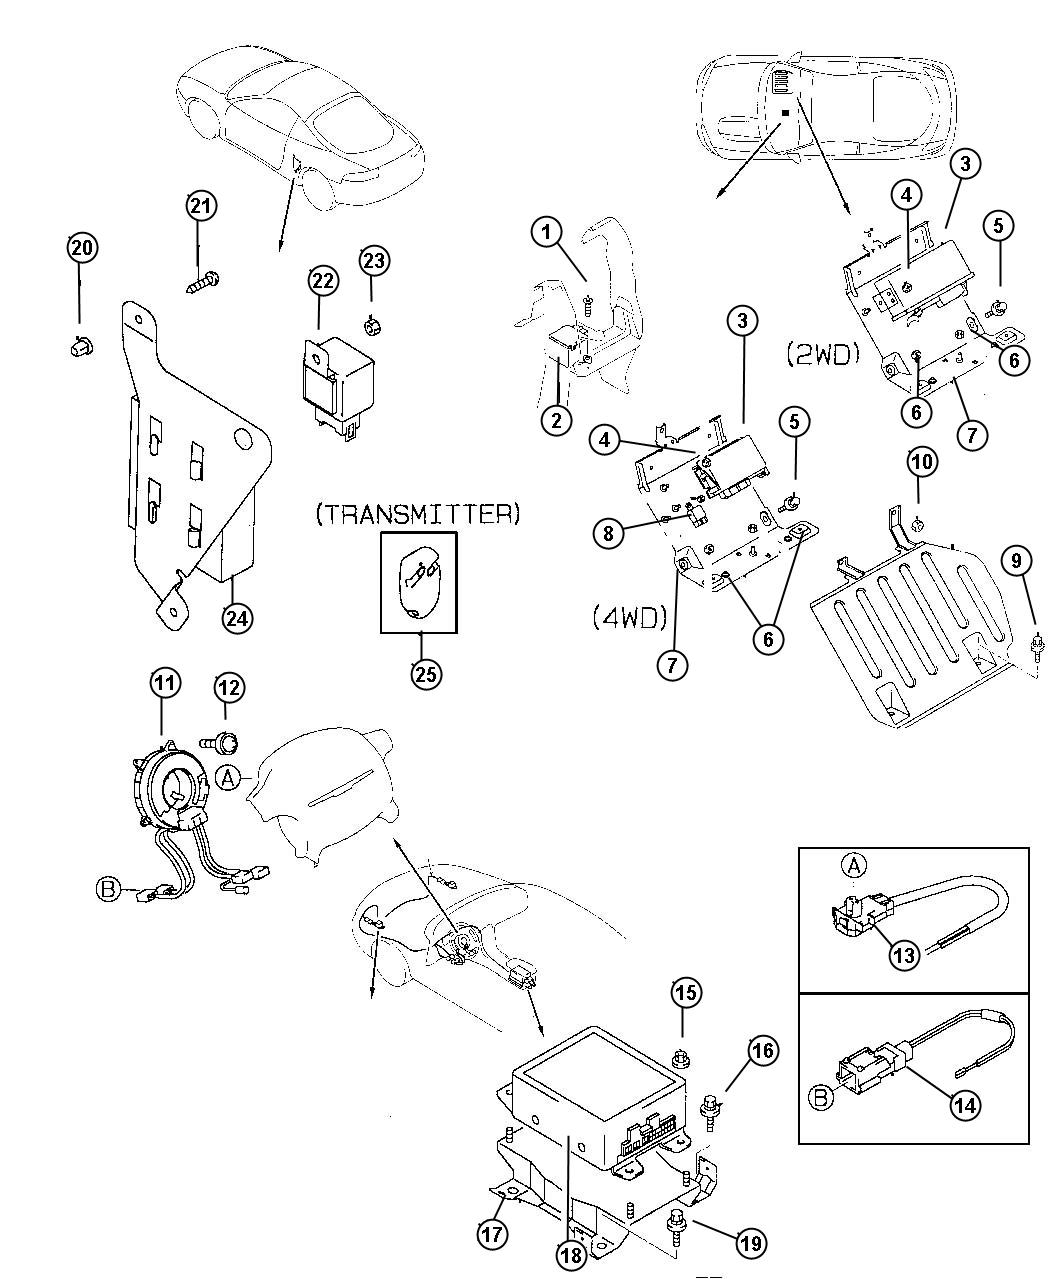 1996 Dodge Avenger Wiring. Air bag adapter. Srs airbag